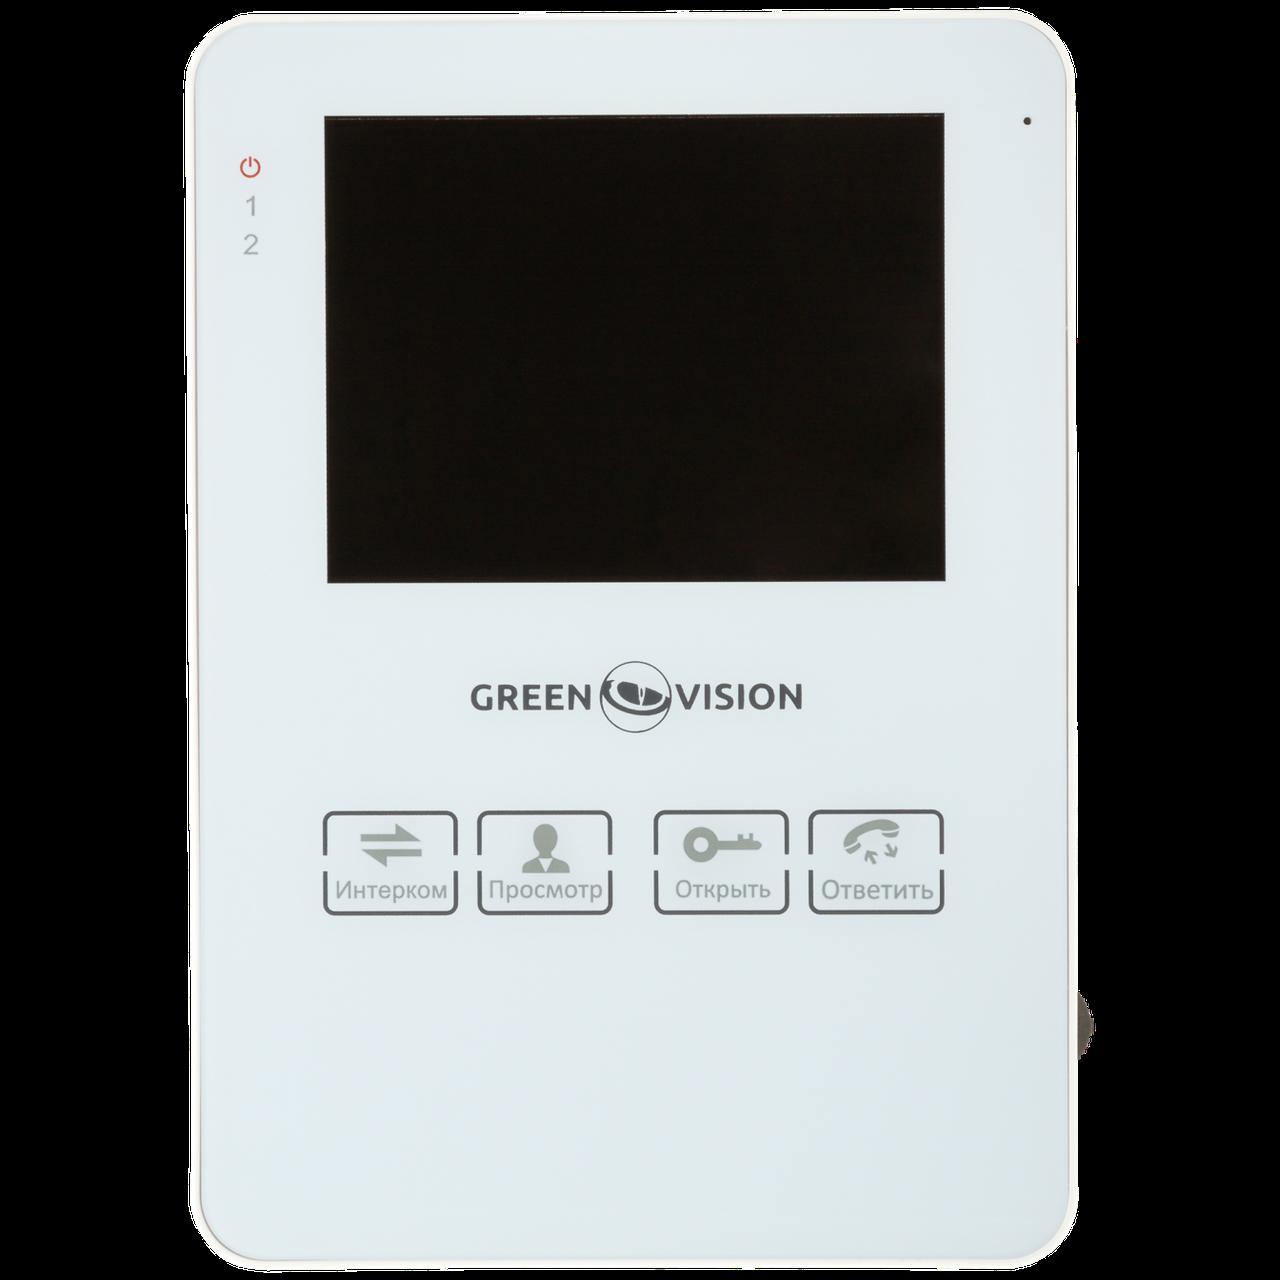 Цветной видеодомофон Green Vision GV-051-J-VD4SD white